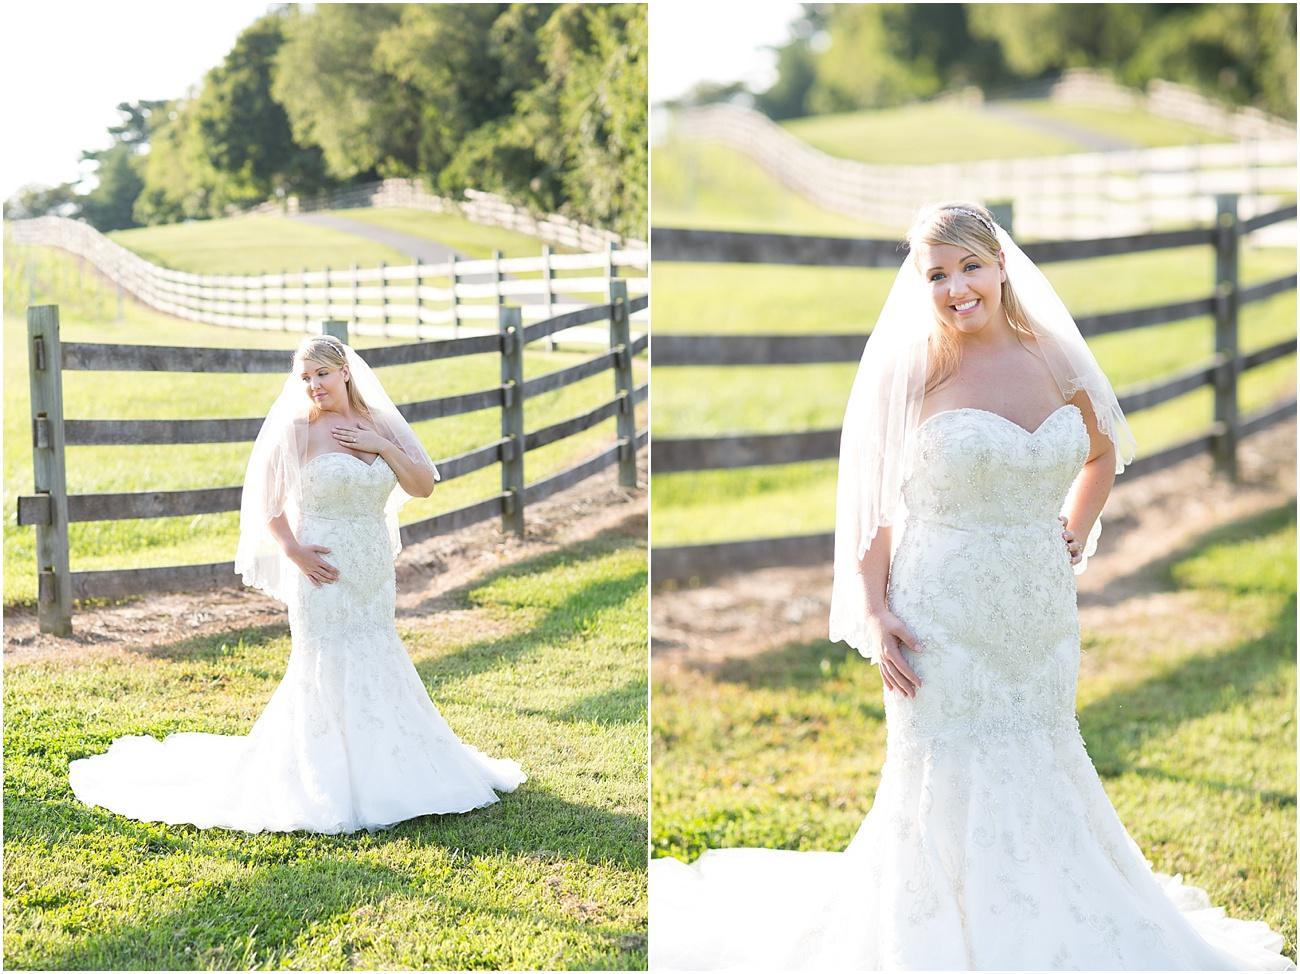 Lacey_Bridal_Portraits_Elk_Manor_Winery_Maryland_Wedding_Photographer_0017